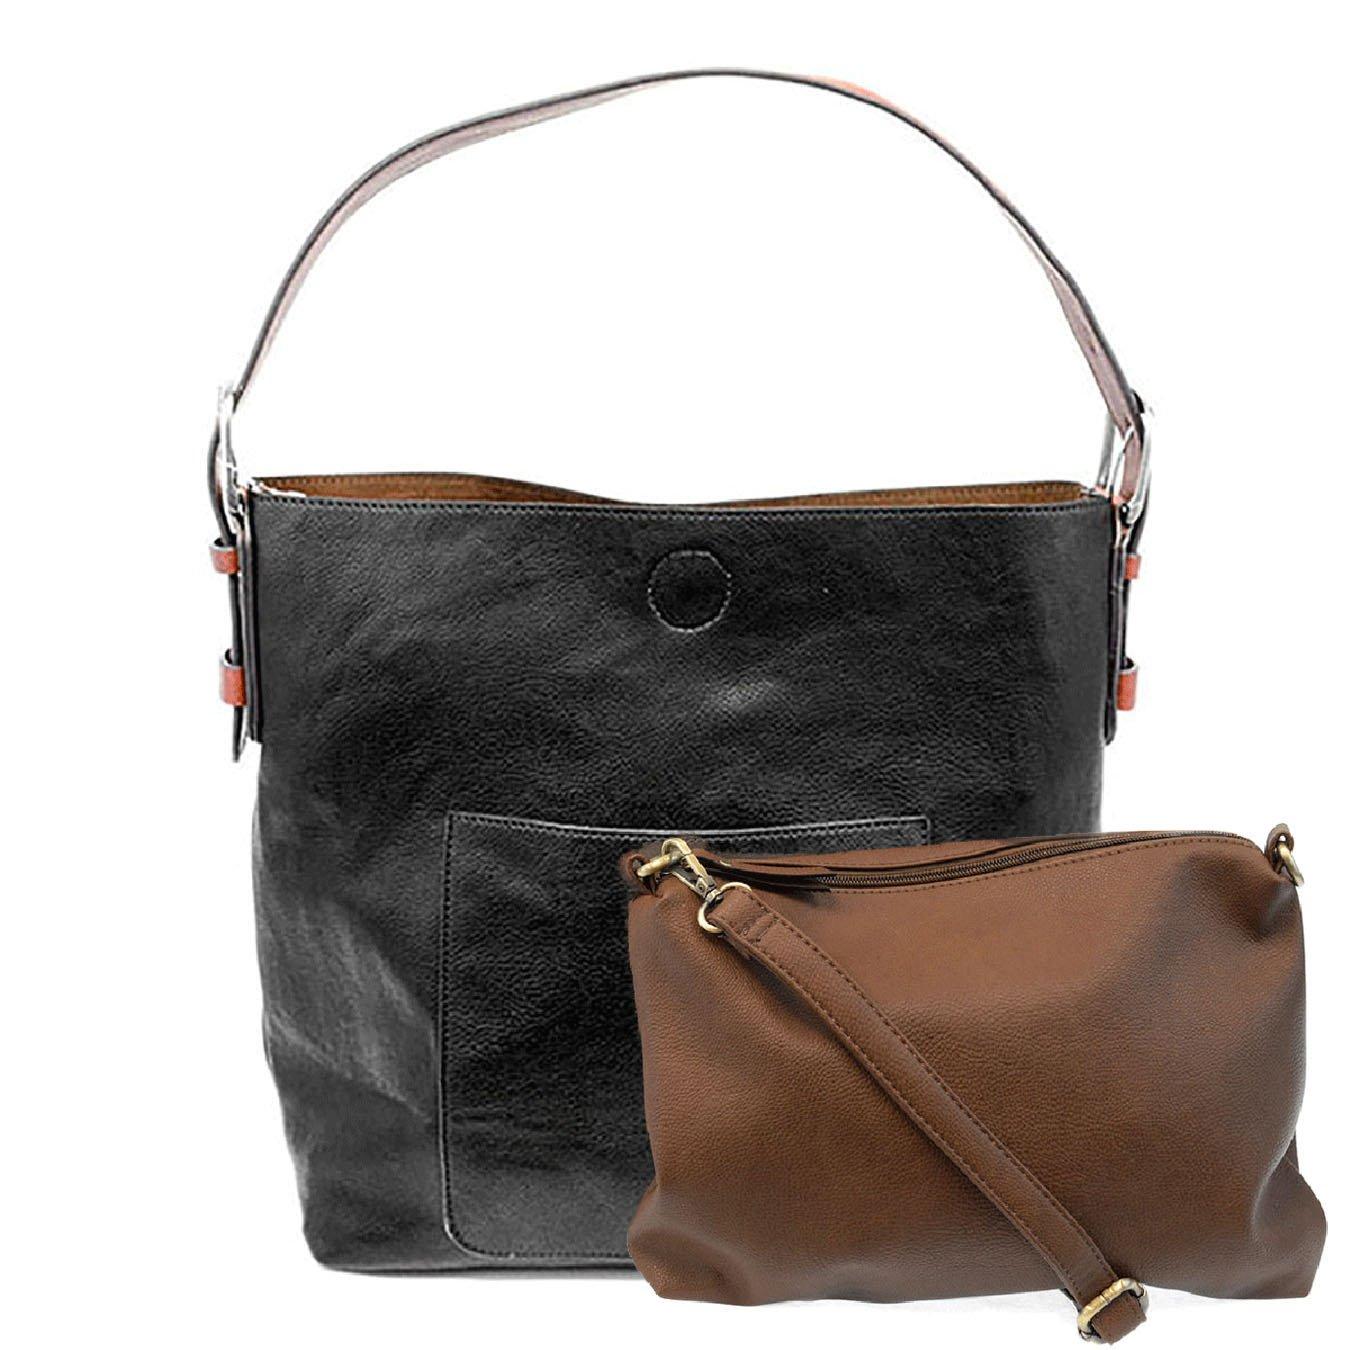 Black Cedar Handle Hobo Handbag By Joy Susan Vegan Leather